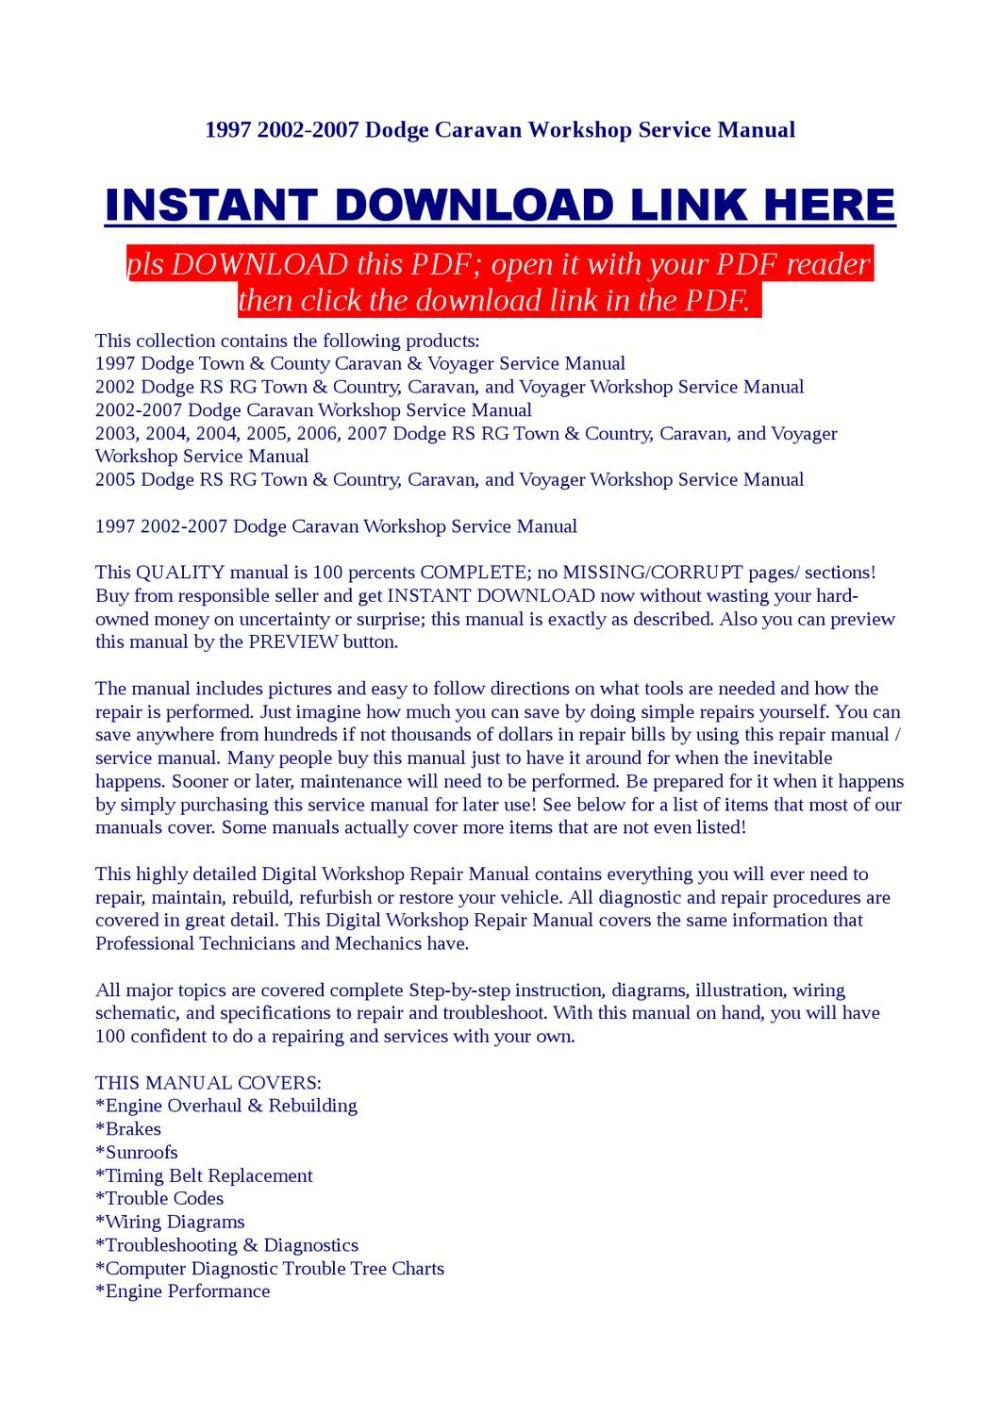 medium resolution of 1997 2002 2007 dodge caravan workshop service manual